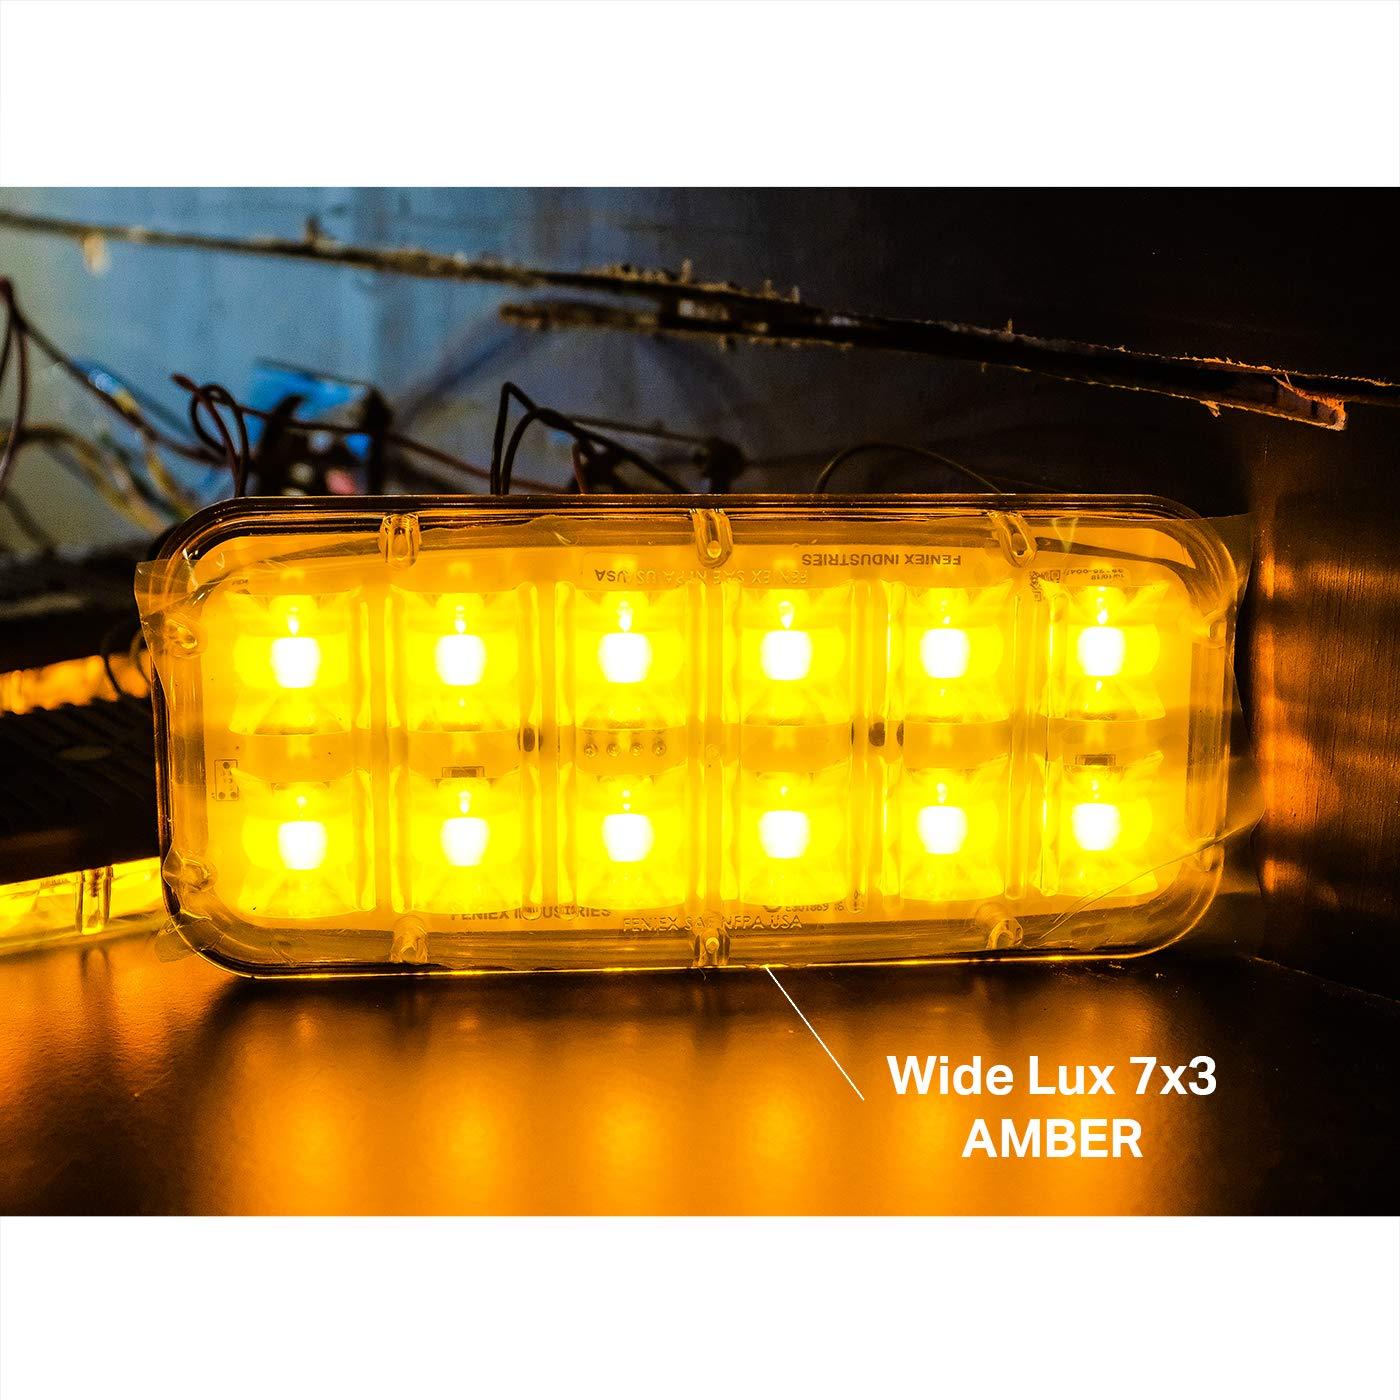 7x3, Blue Feniex A-3700 Wide-LUX